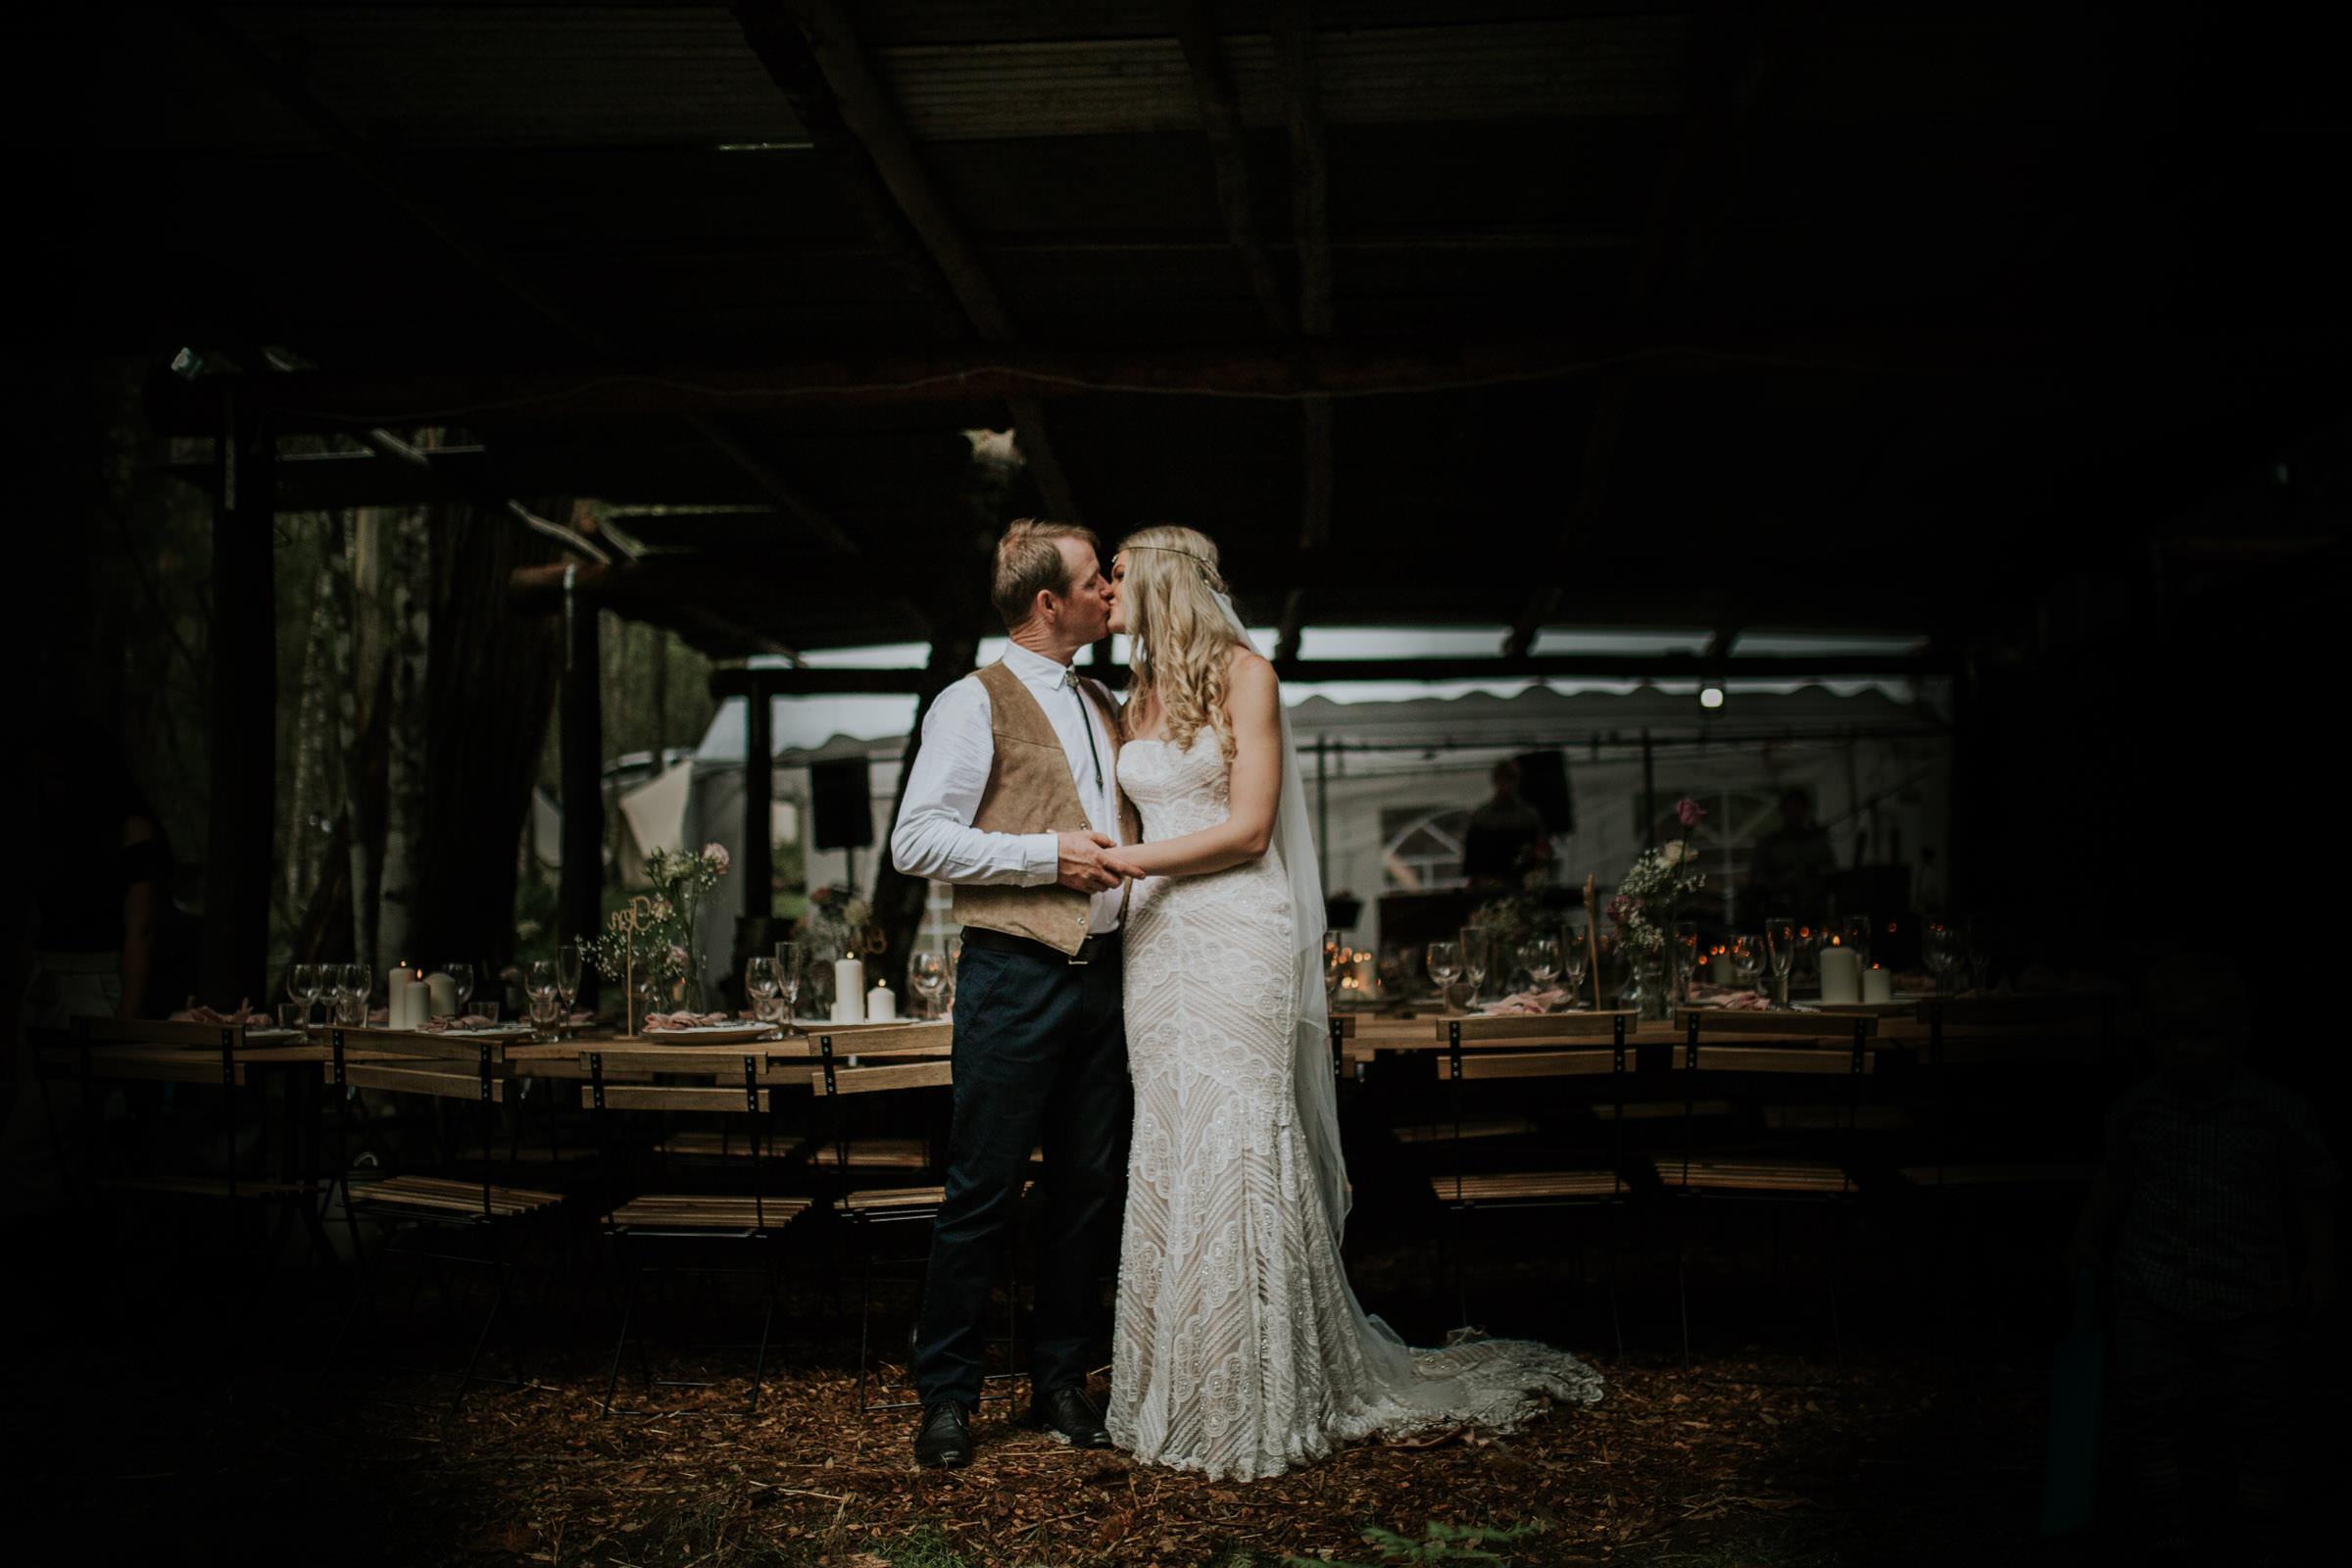 Emma+John+Far+South+Coast+Wedding+Festivl+Glamping+Bush-141.jpg